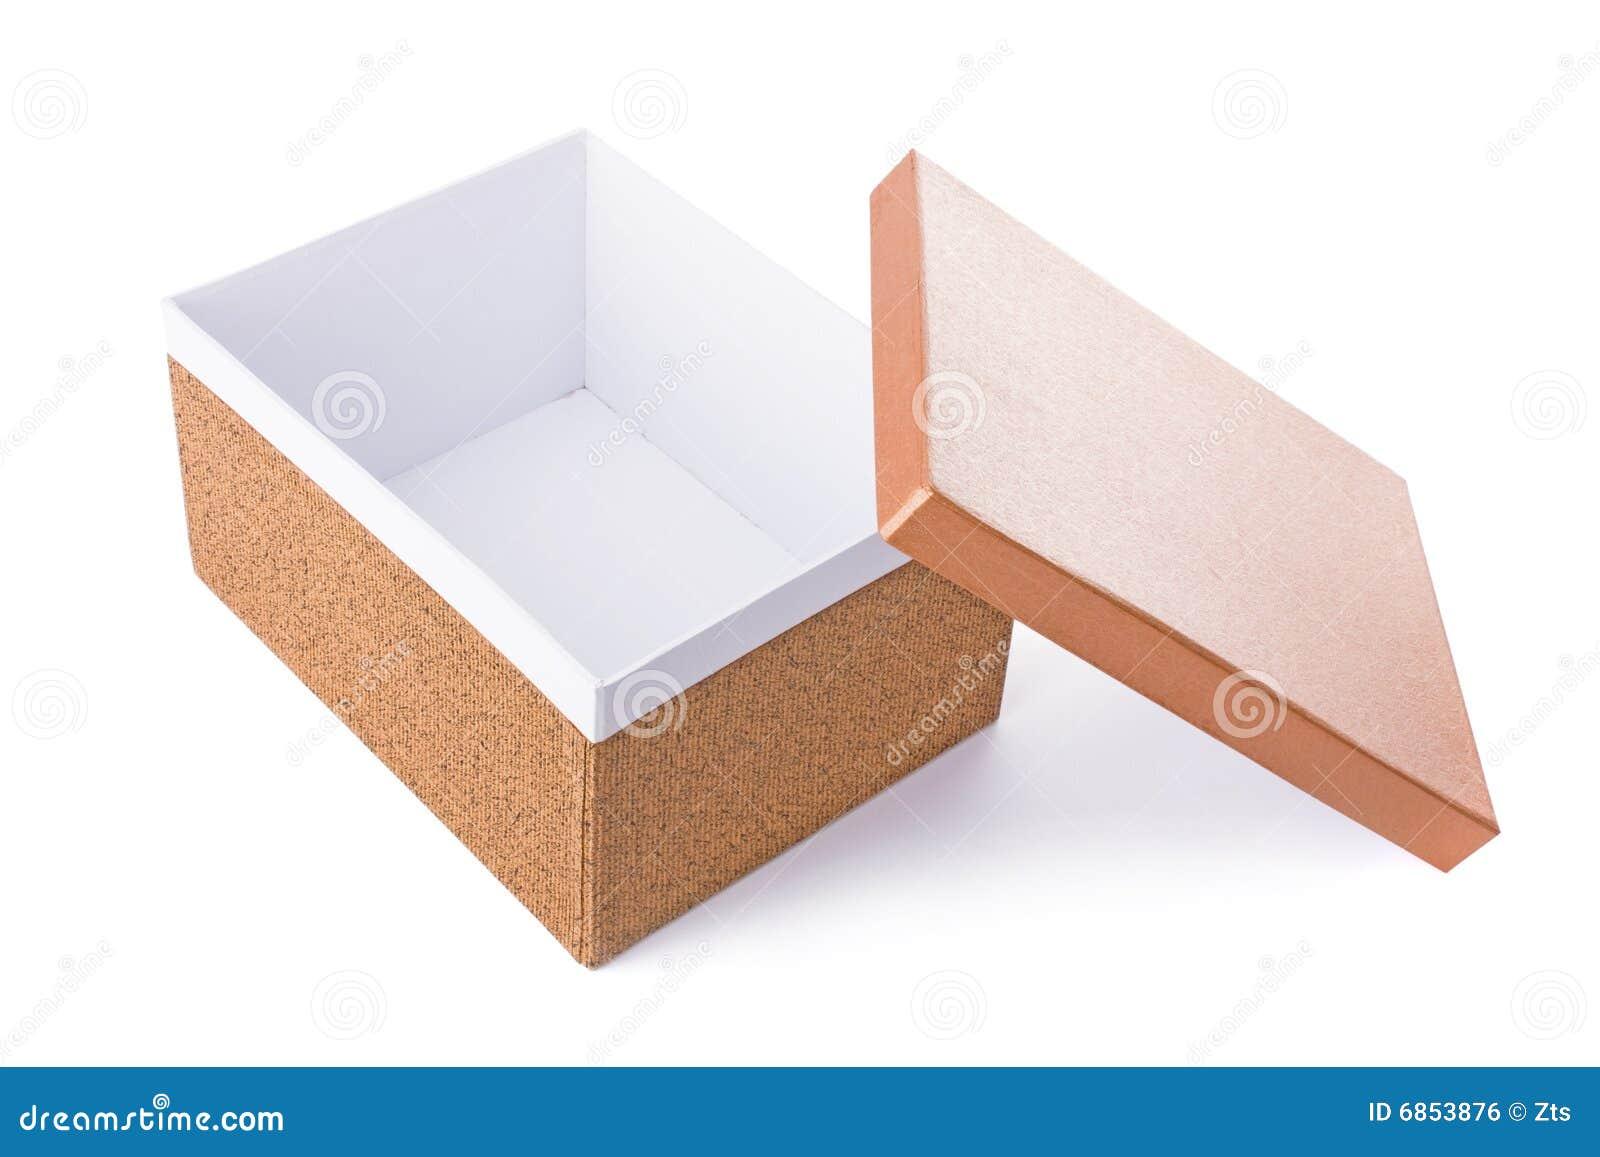 Decorative Box Plans Free : Open decorative box royalty free stock image